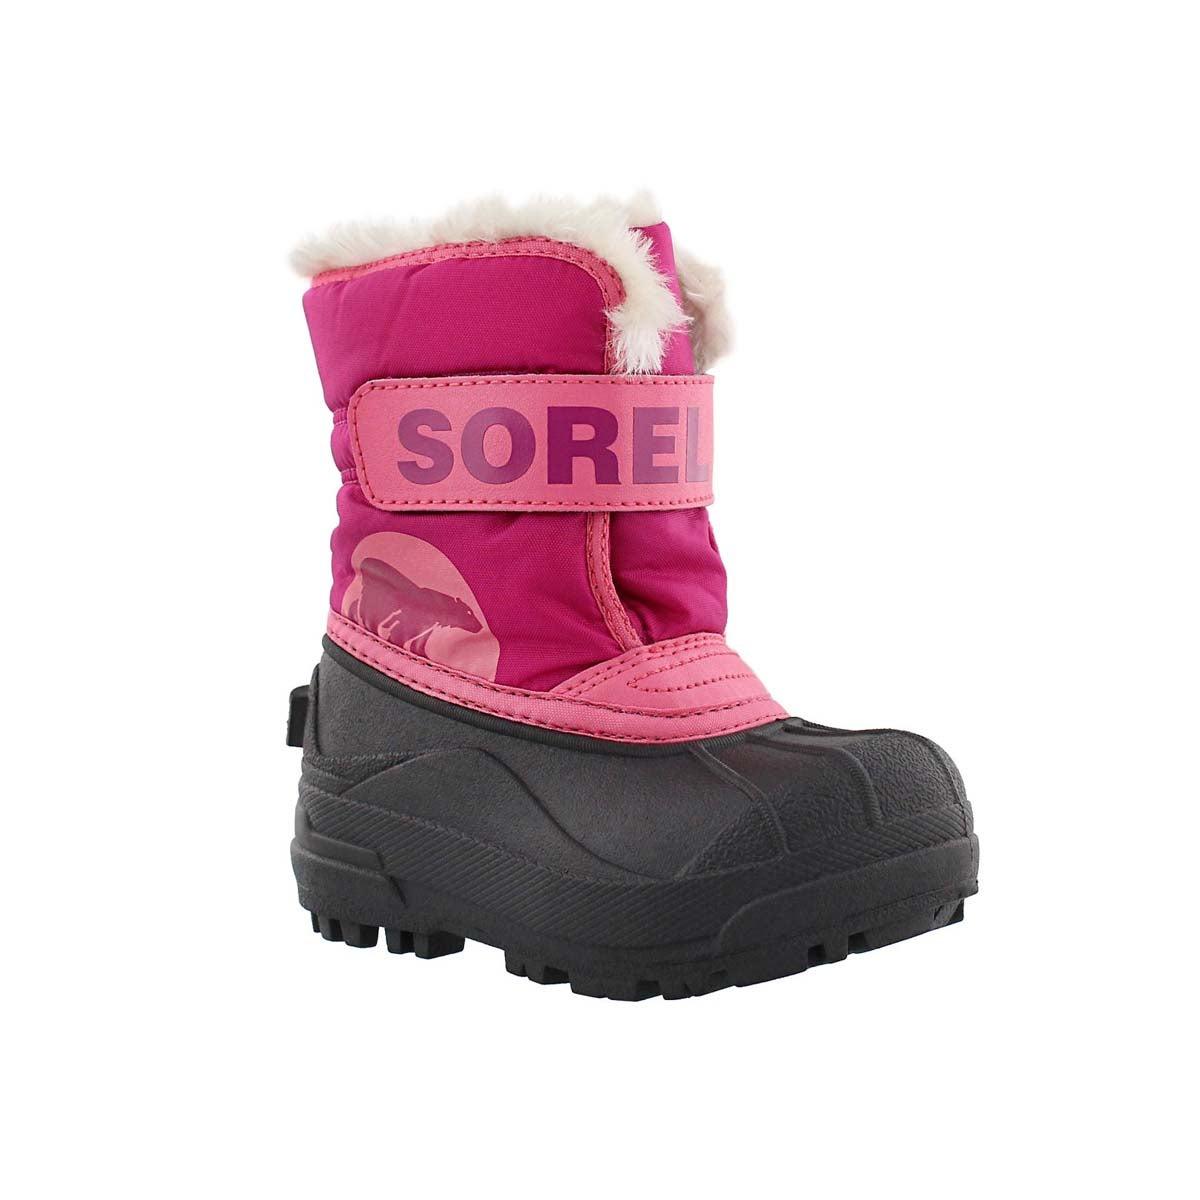 Infants' SNOW COMMANDER pink/blush boots